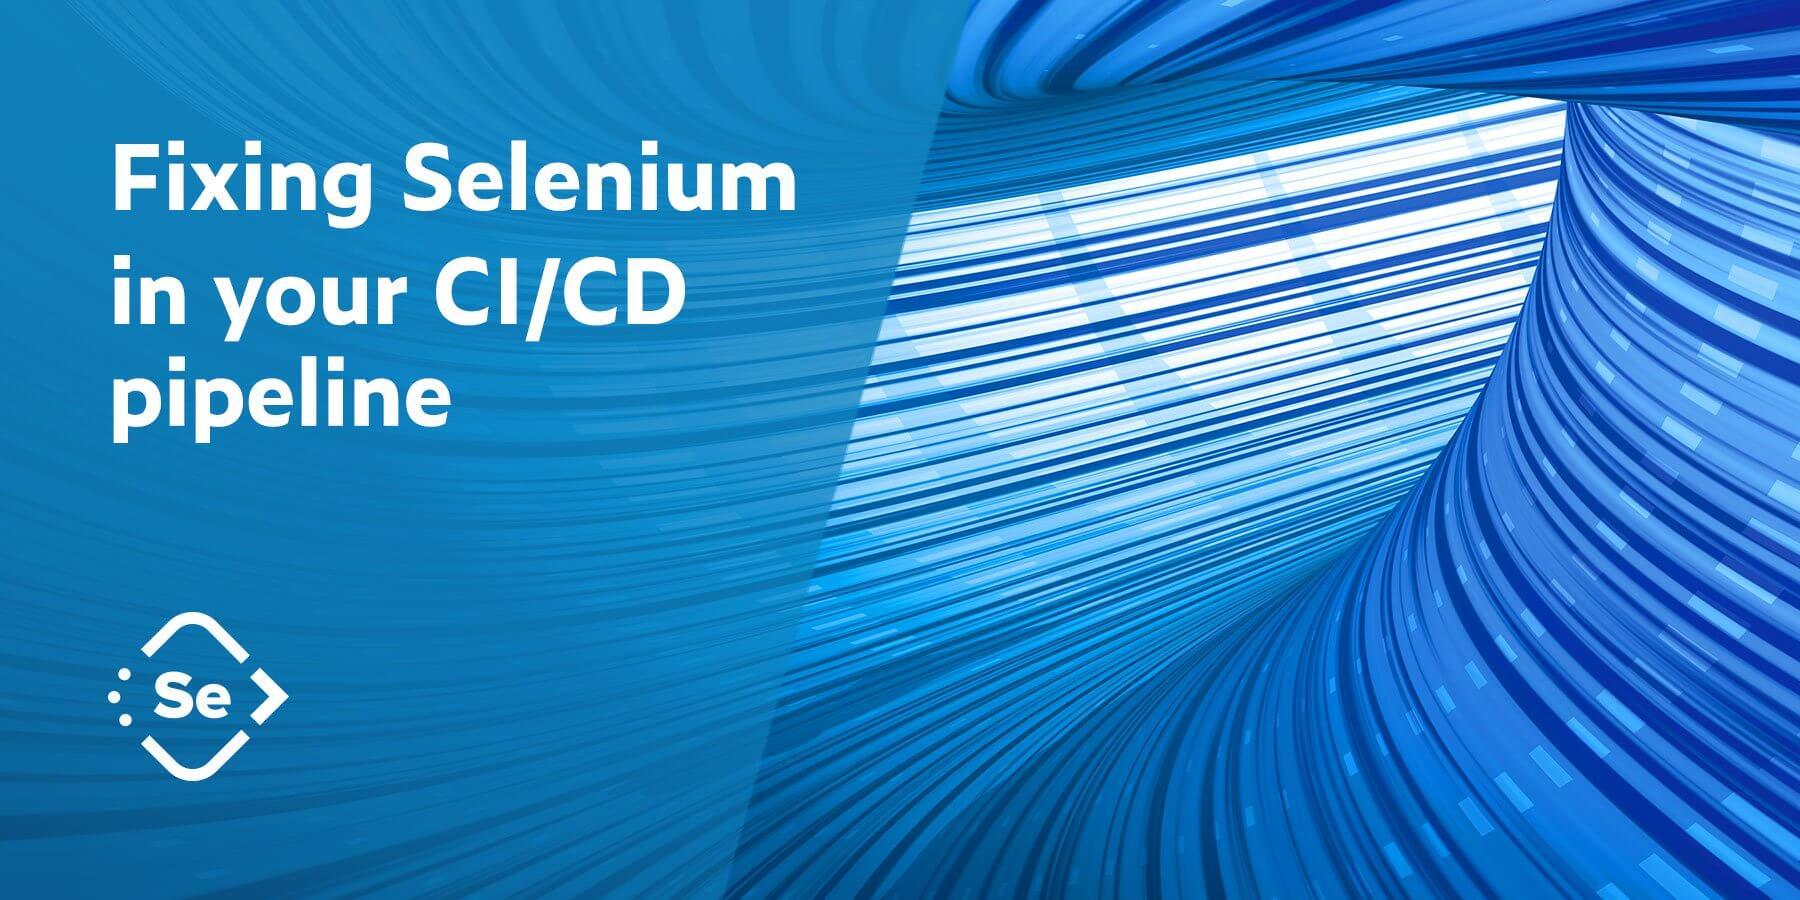 Fixing Selenium in Your CI/CD Pipeline